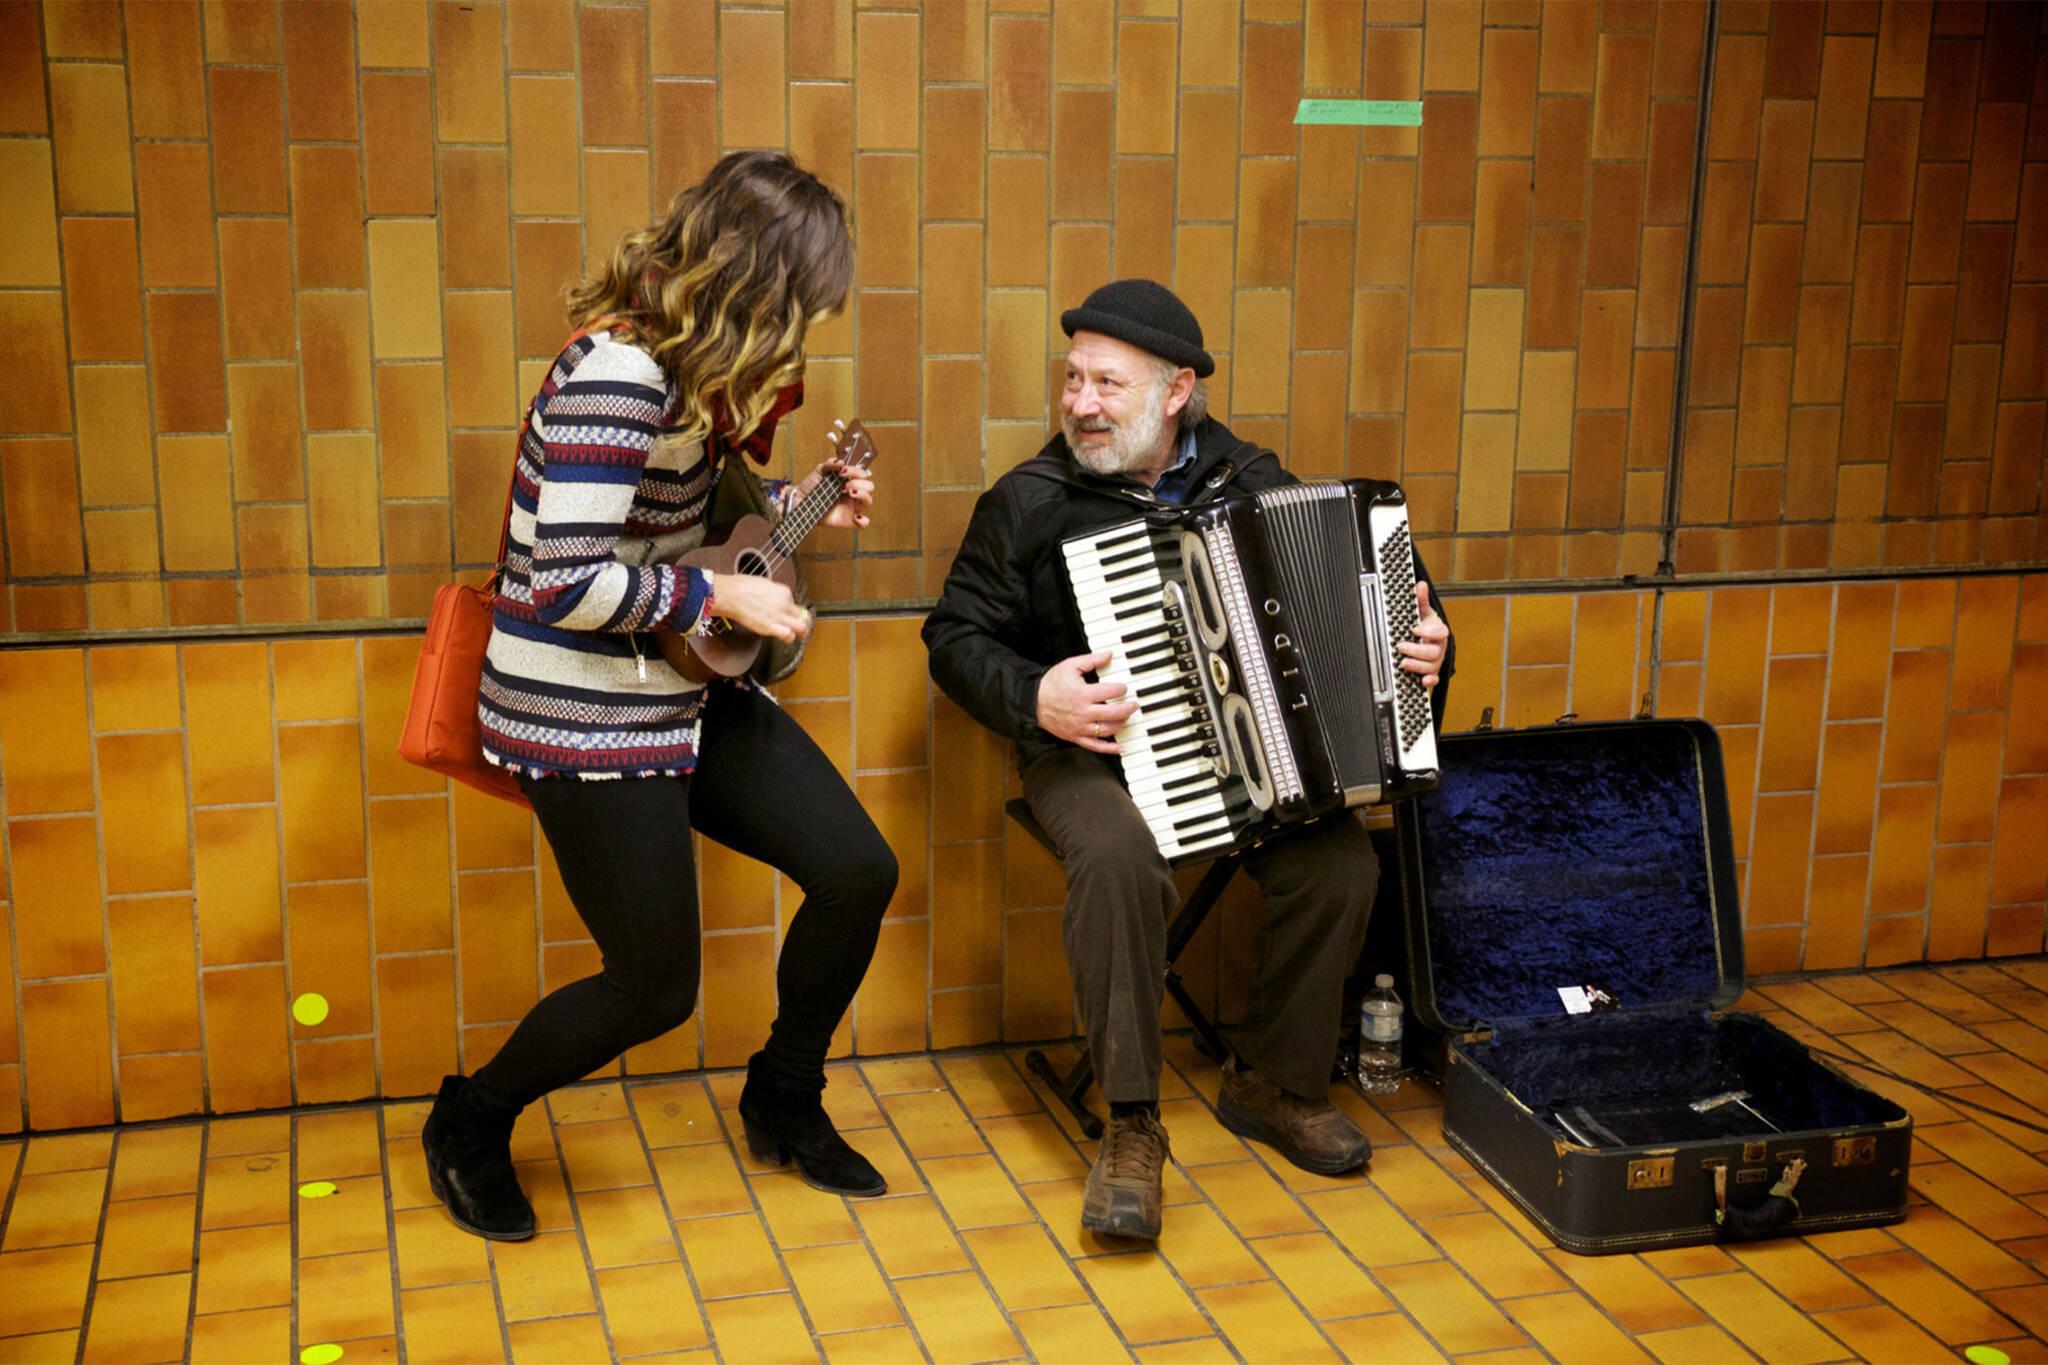 TTC subway musicians